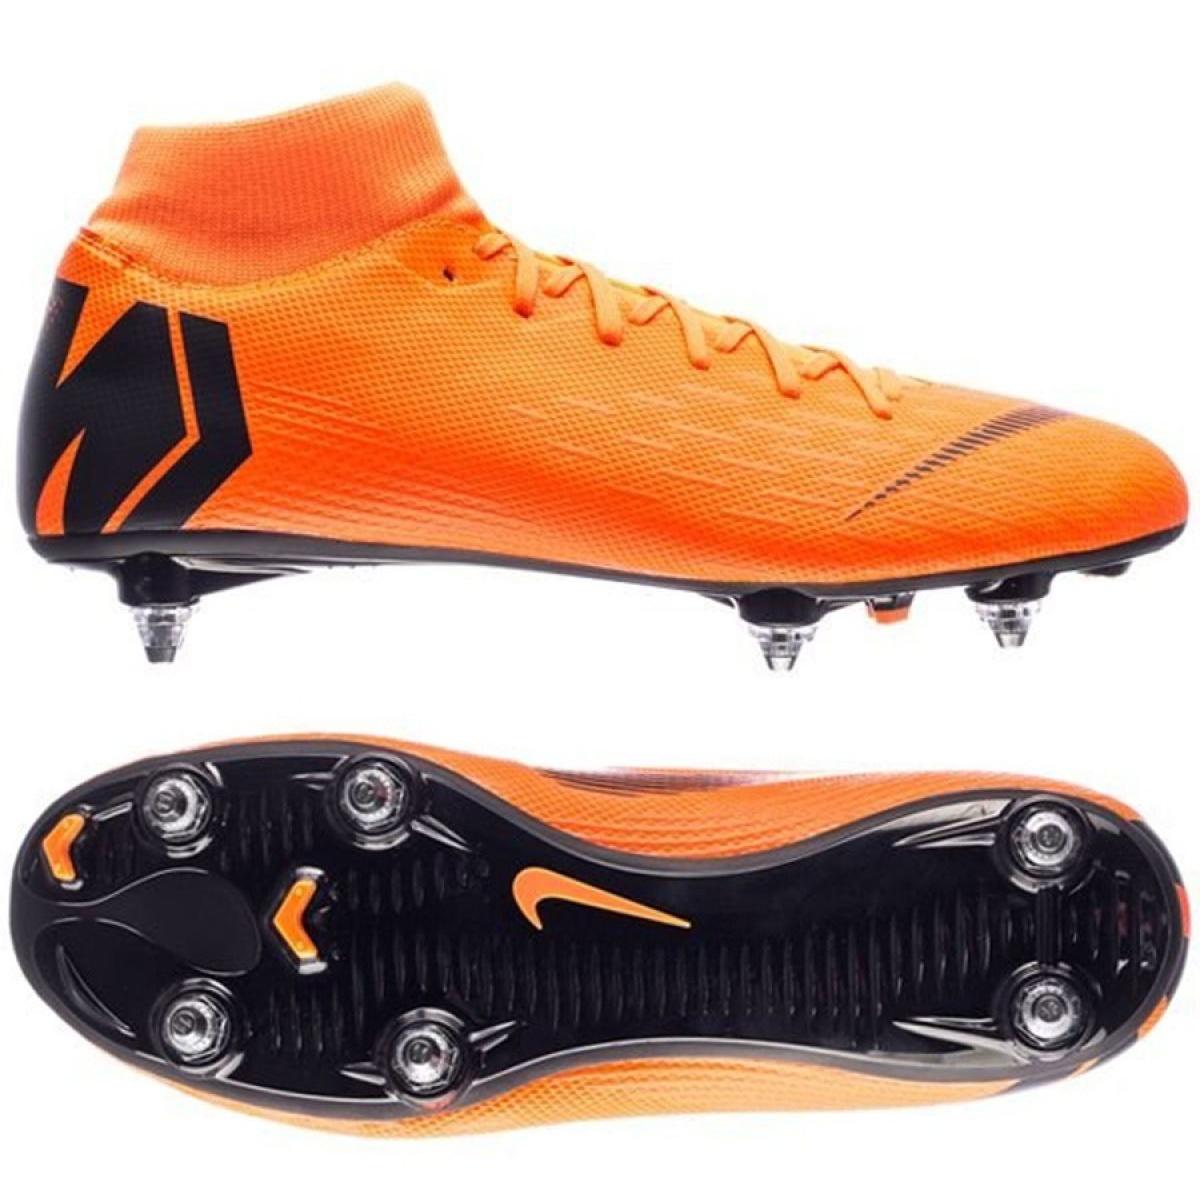 best website d0cd7 162f5 Nike Mercurial Superfly 6 Academy Sg Pro M AH7364-810 Football Shoes